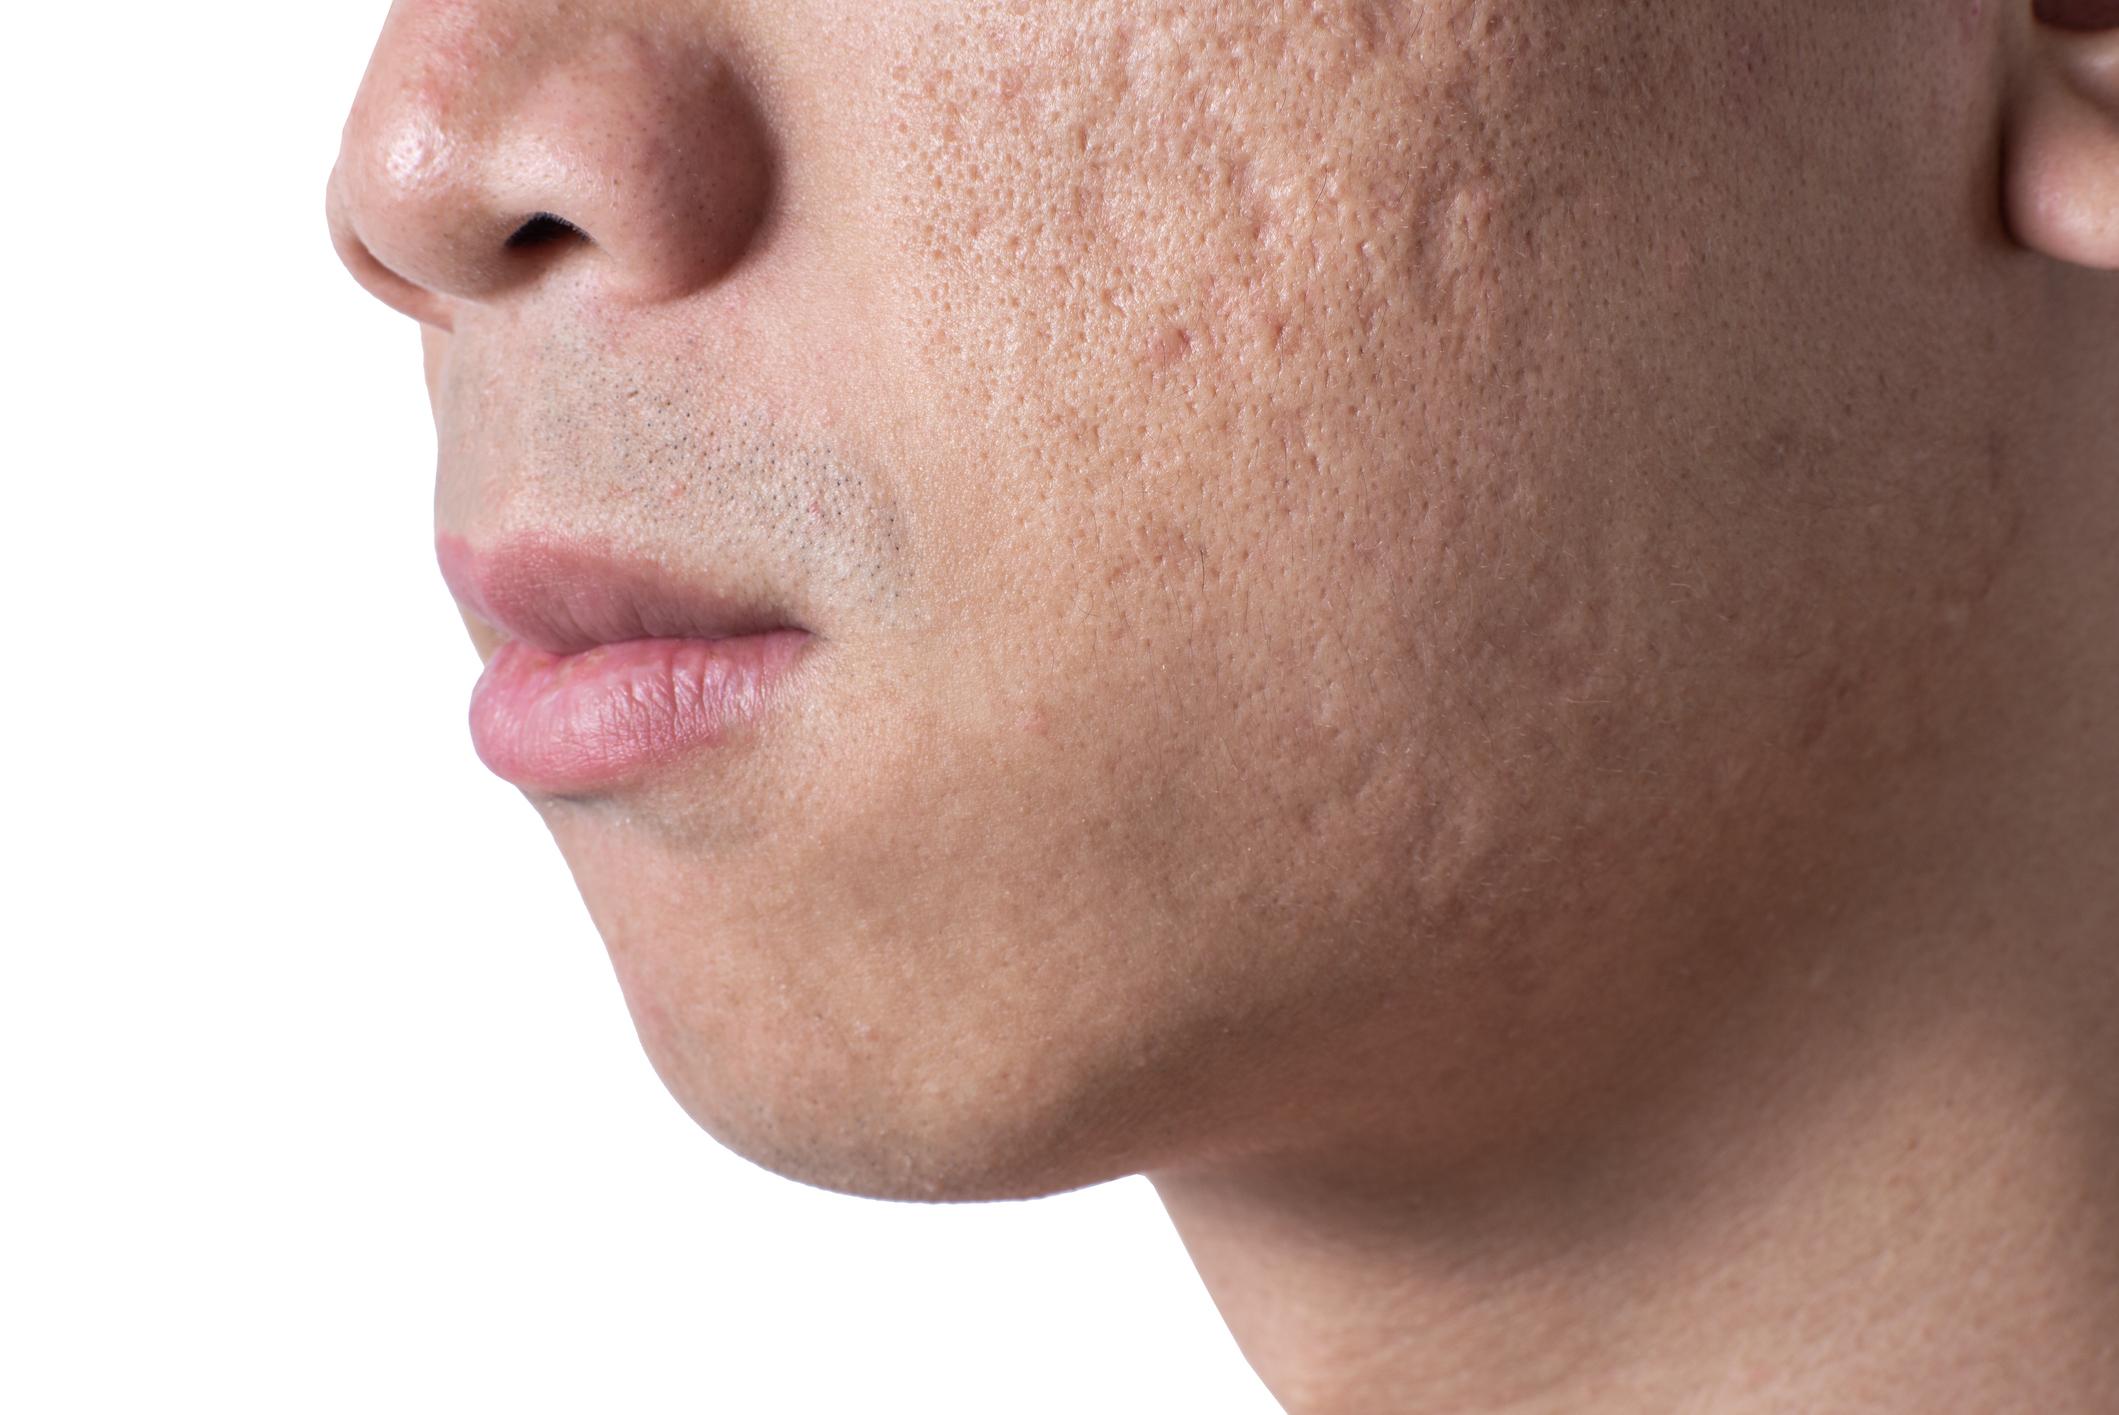 Chemical Reconstruction Plus Fractionated Nonablative Laser Improves Appearance Of Acne Scars Dermatology Advisor